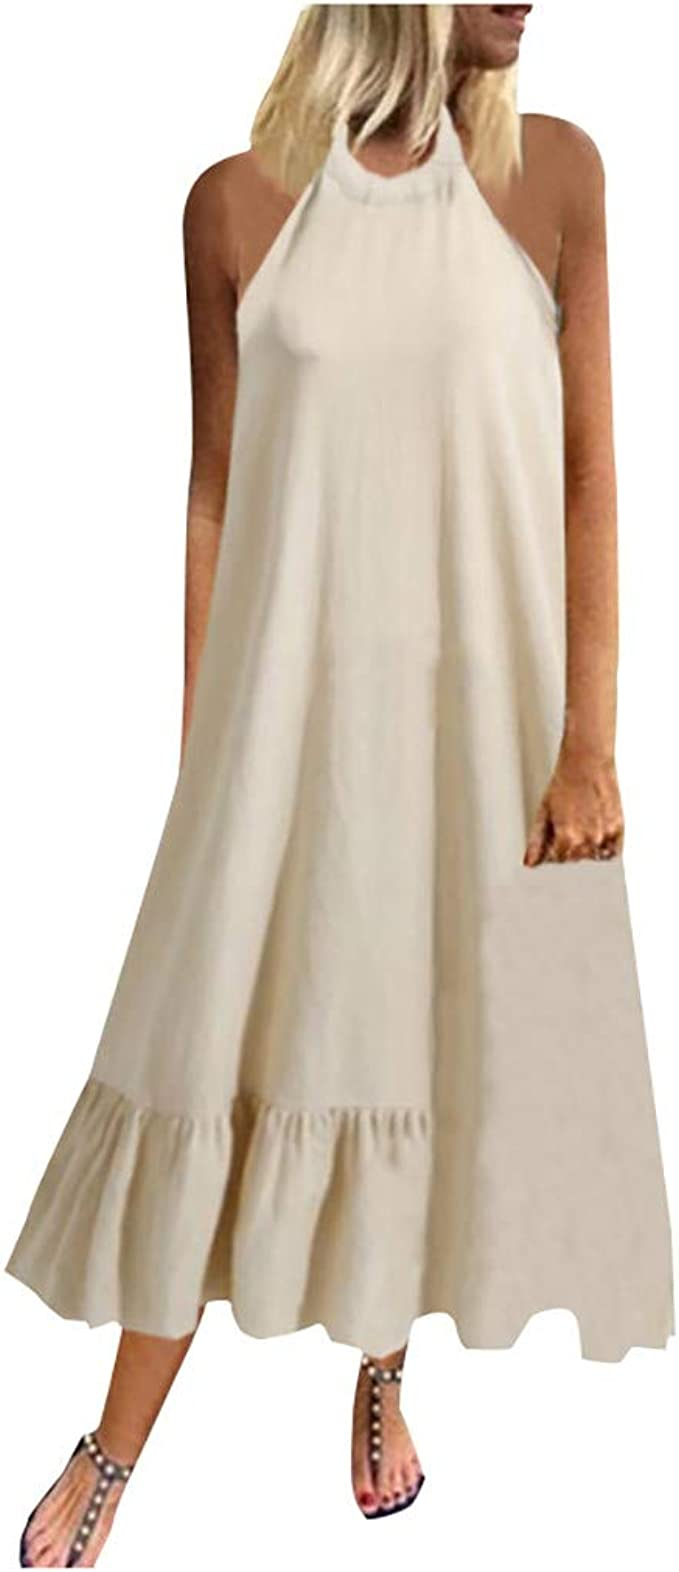 Elegant Kleider Damen Business Sommer Casual Böhmen Petticoat